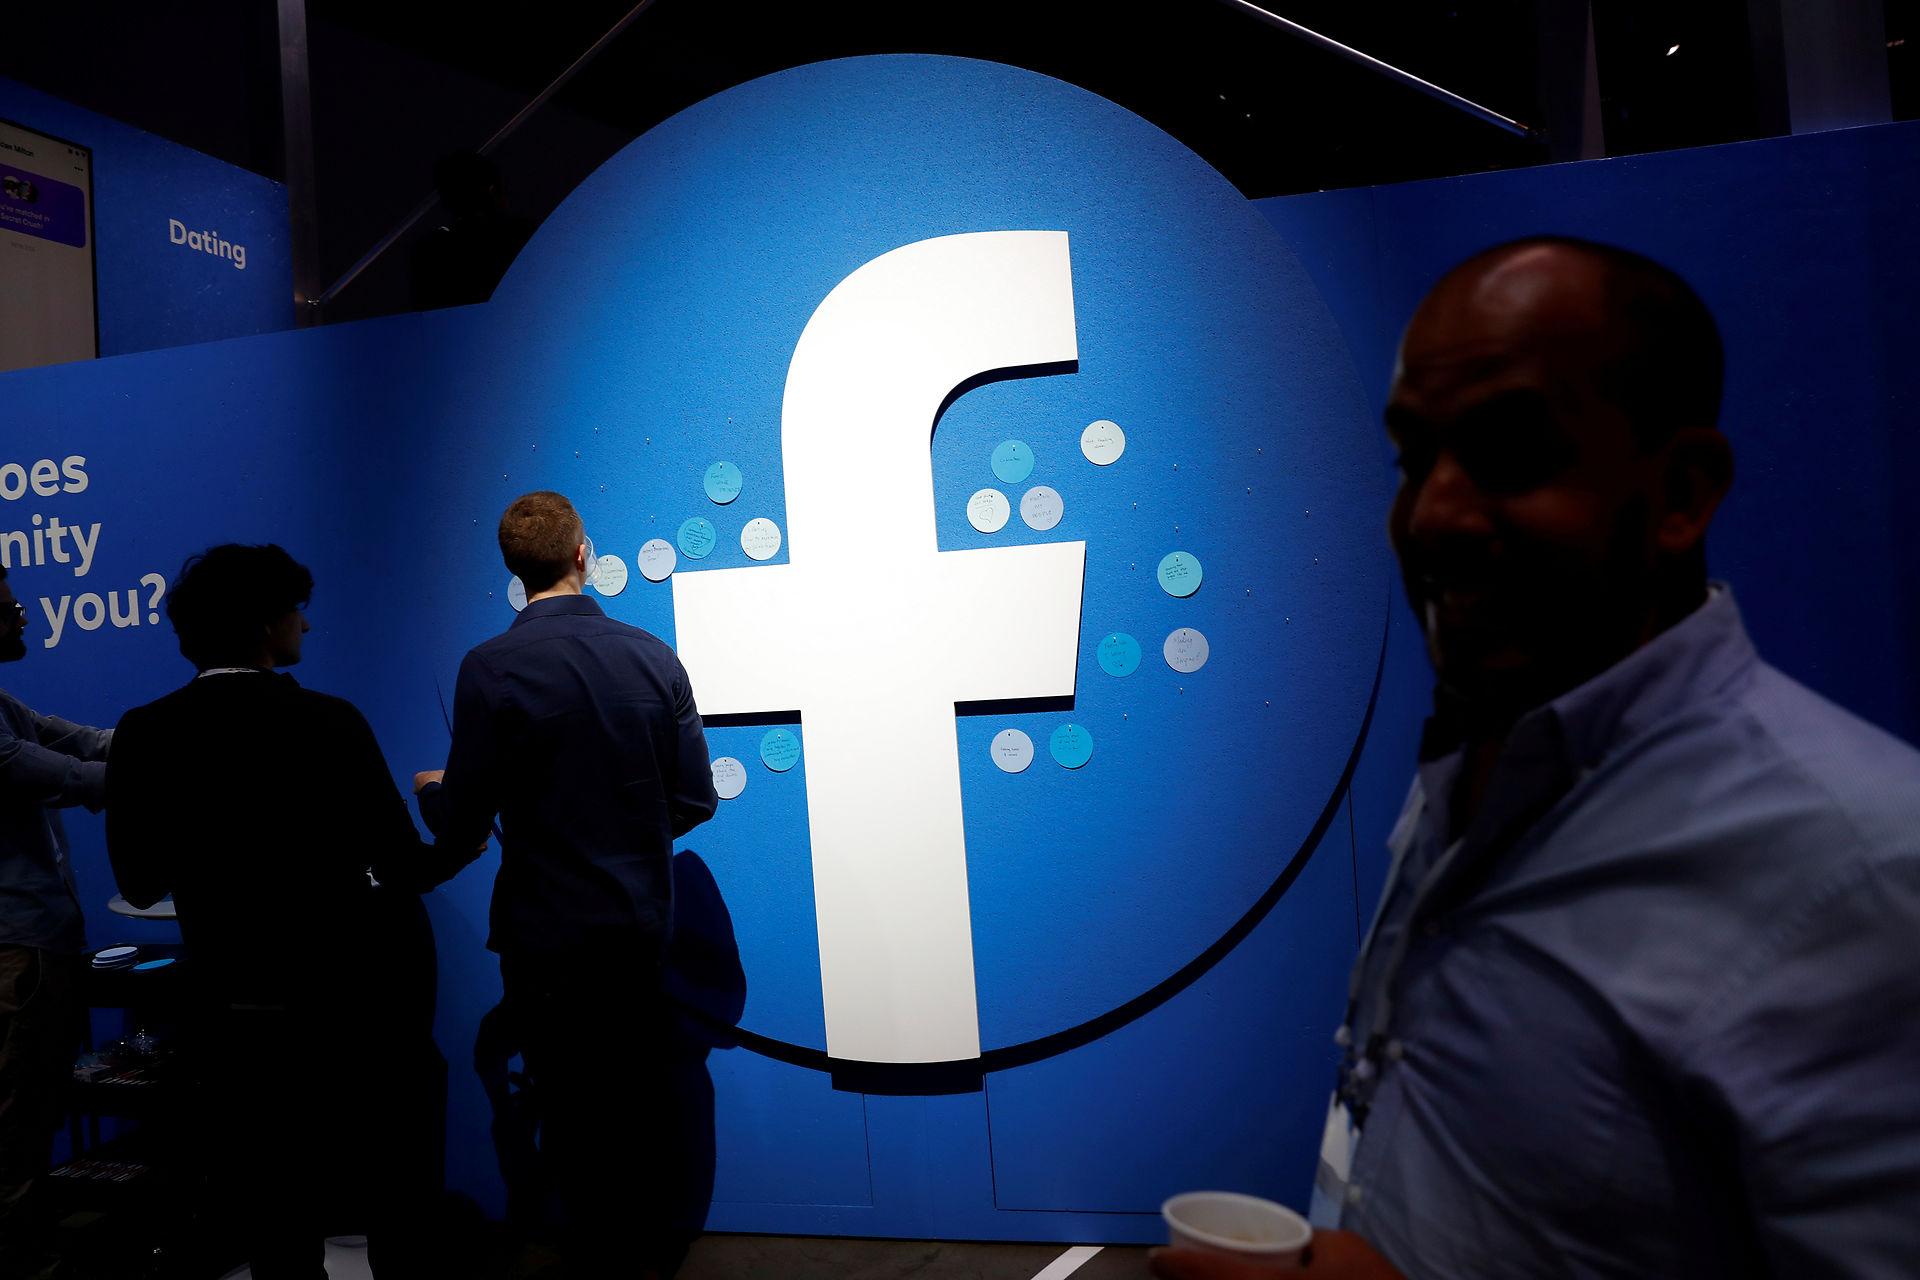 Corona forsinker forslag til regulering og ansvar for indhold på sociale medier